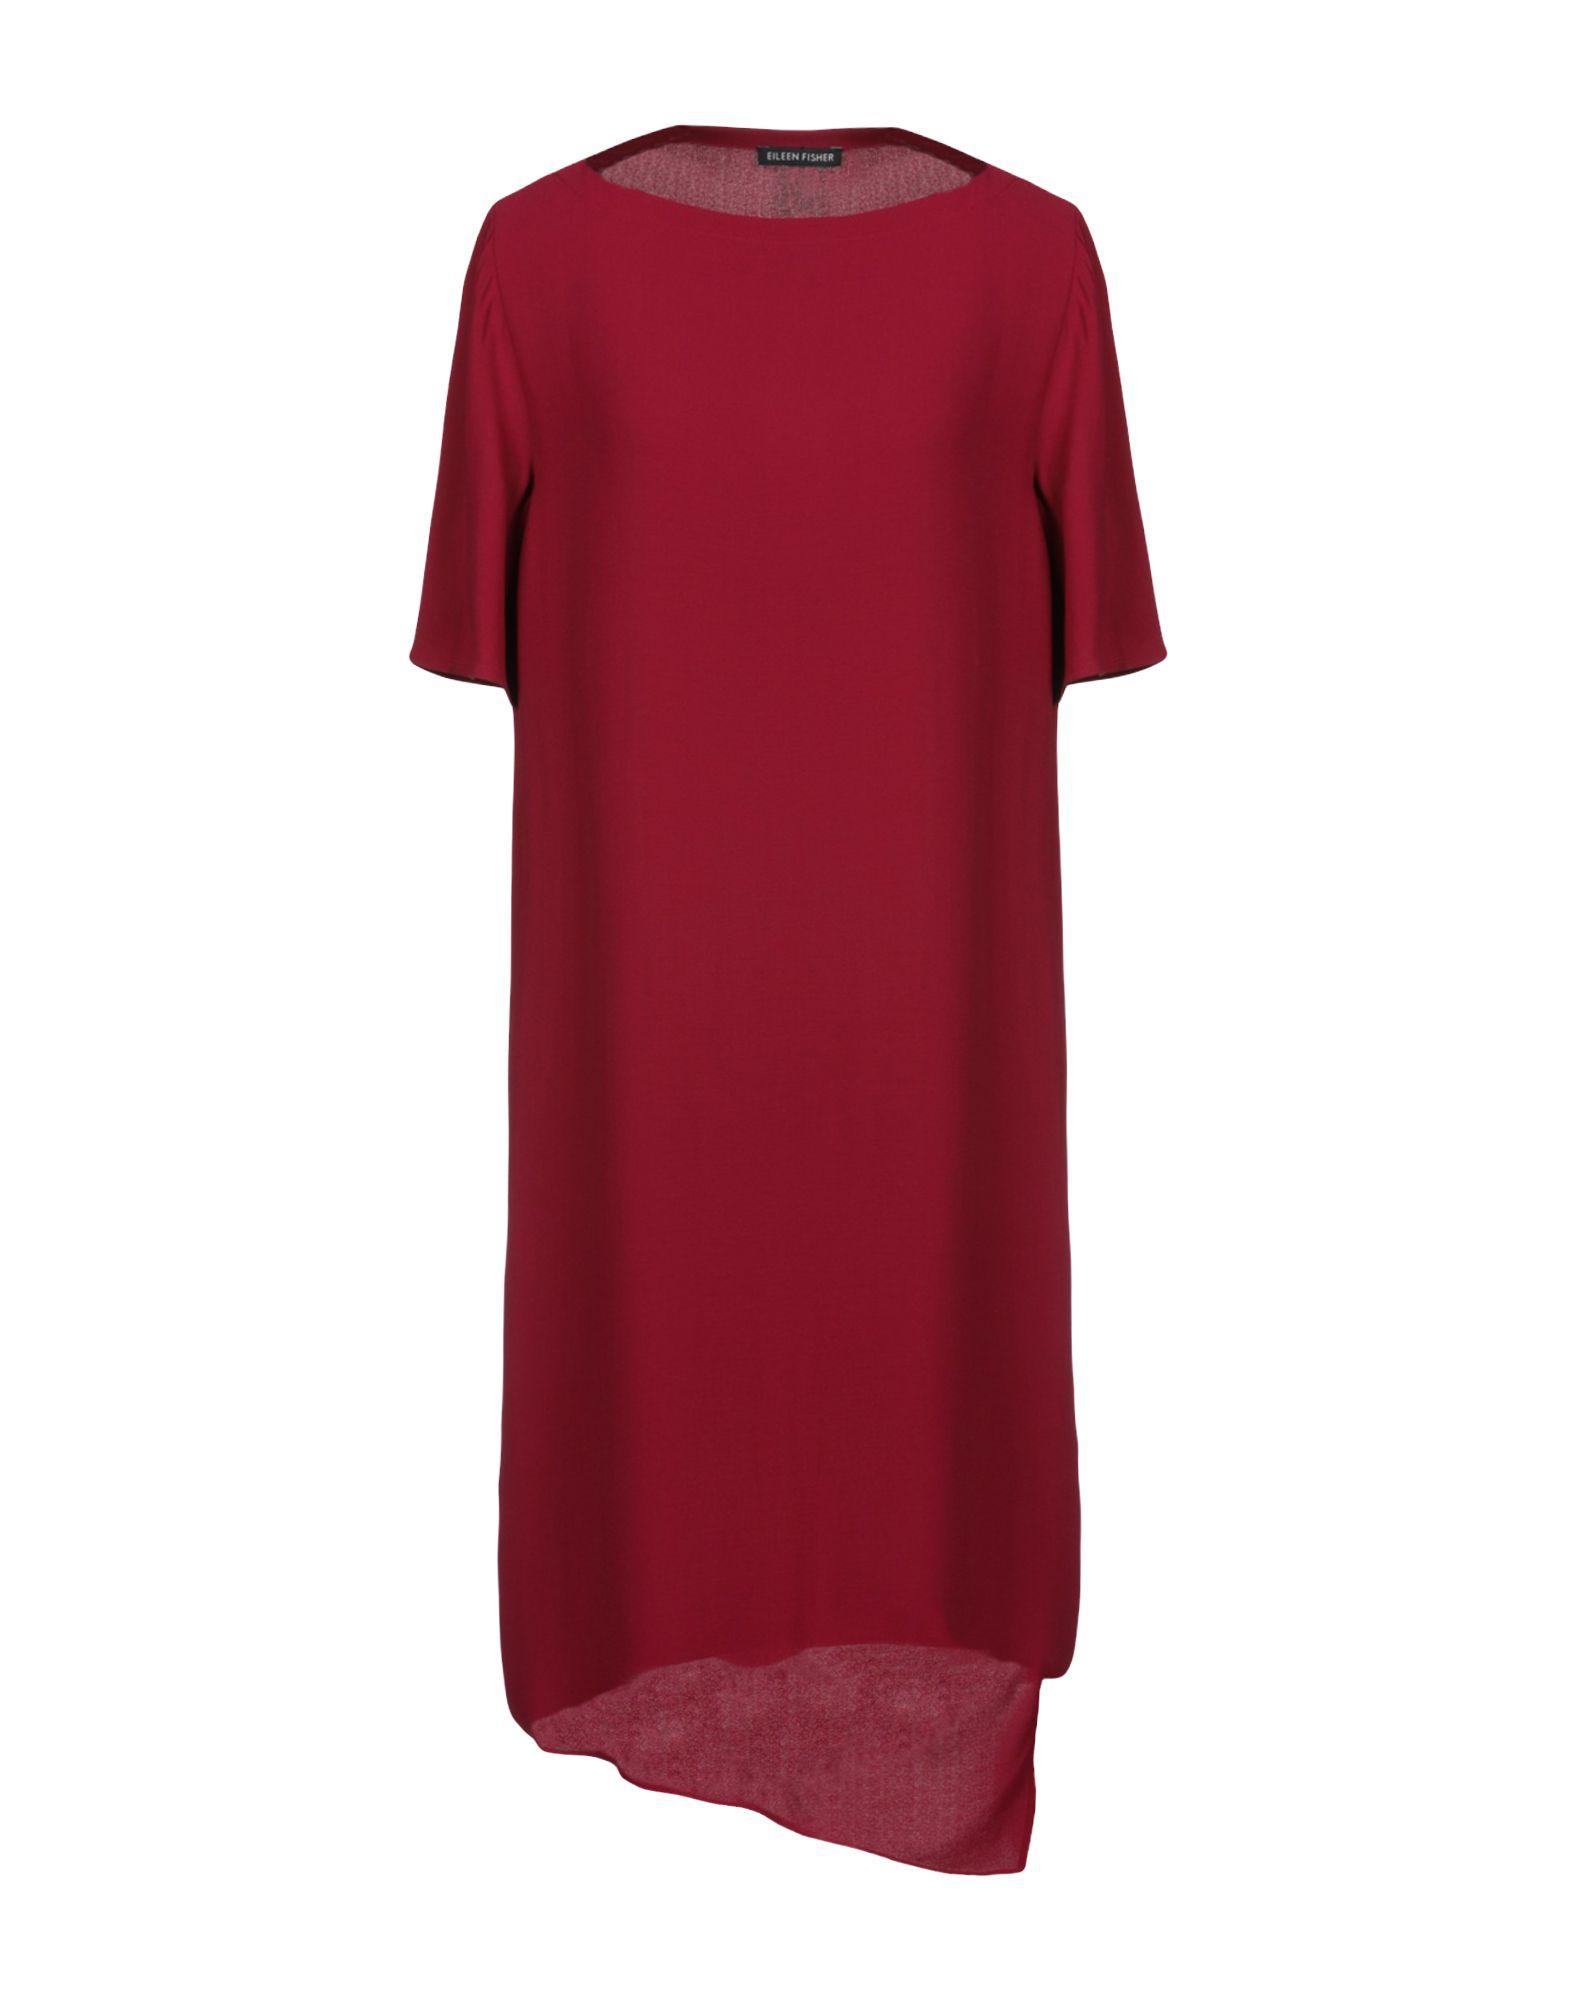 EILEEN FISHER Короткое платье eileen fisher new black long sleeve drape top msrp $278 00